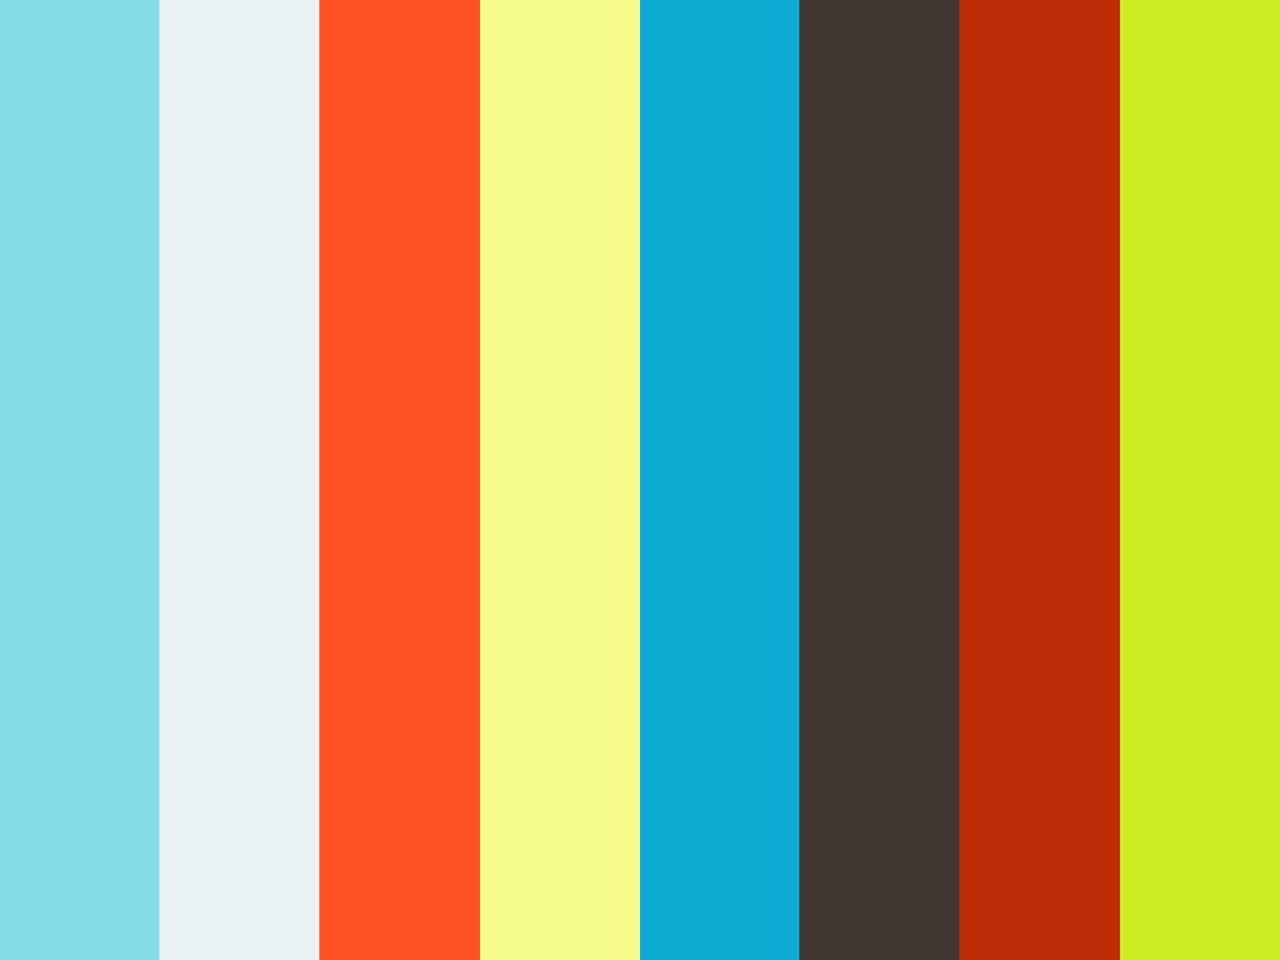 tembi locke net worthtembi locke imdb, tembi locke movies and tv shows, tembi locke age, tembi locke instagram, tembi locke daughter, tembi locke net worth, tembi locke fresh prince, tembi locke husband, tembi locke parents, tembi locke biography, tembi locke friends, tembi locke, tembi locke hot, tembi locke pictures, tembi locke birthday, tembi locke commercial, tembi locke measurements, tembi locke nudography